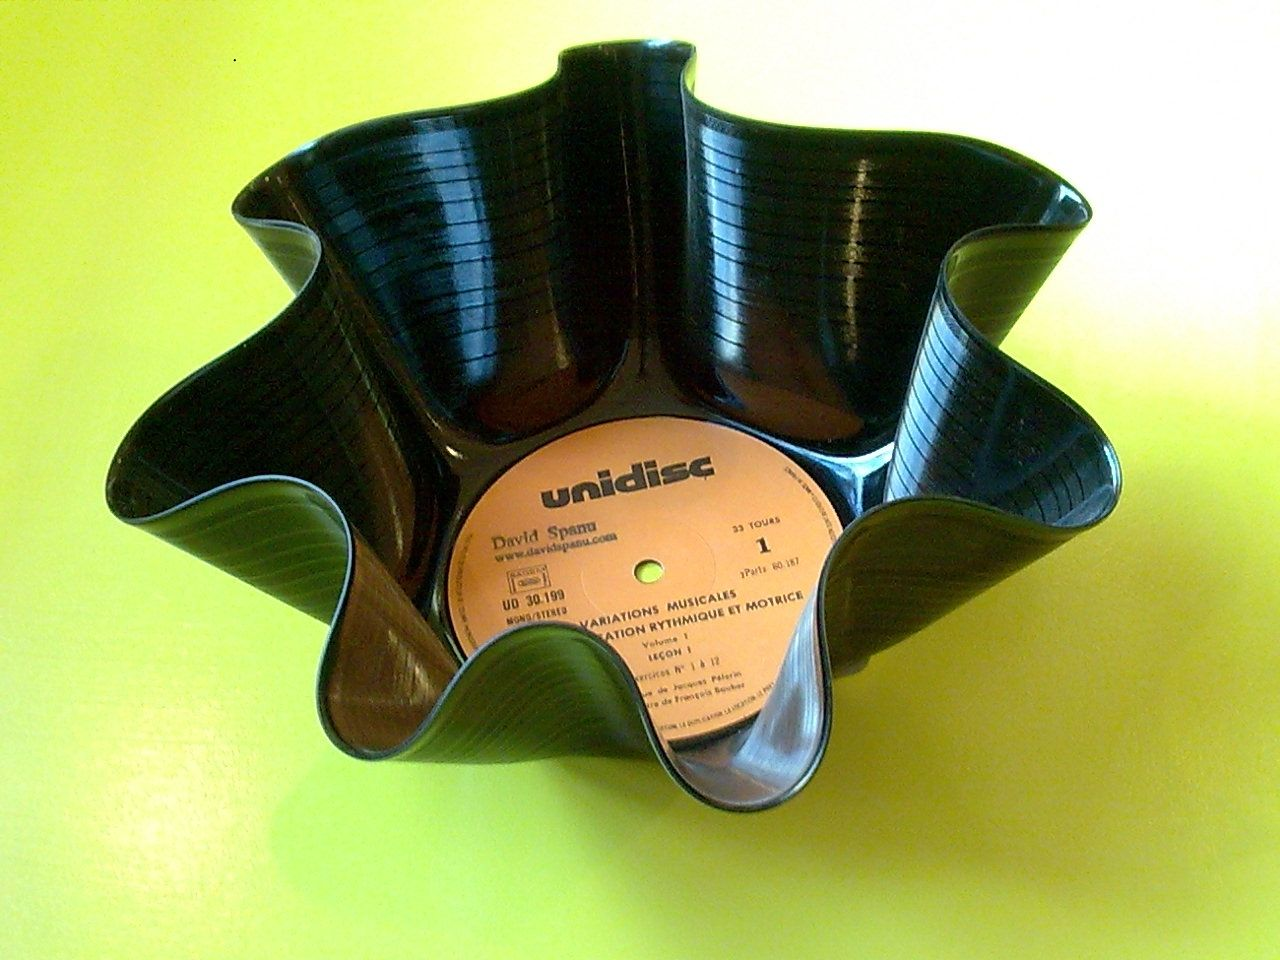 recyclage vinyle idees pour recycler disque vinyle astuces bricolage bricolage et diy. Black Bedroom Furniture Sets. Home Design Ideas